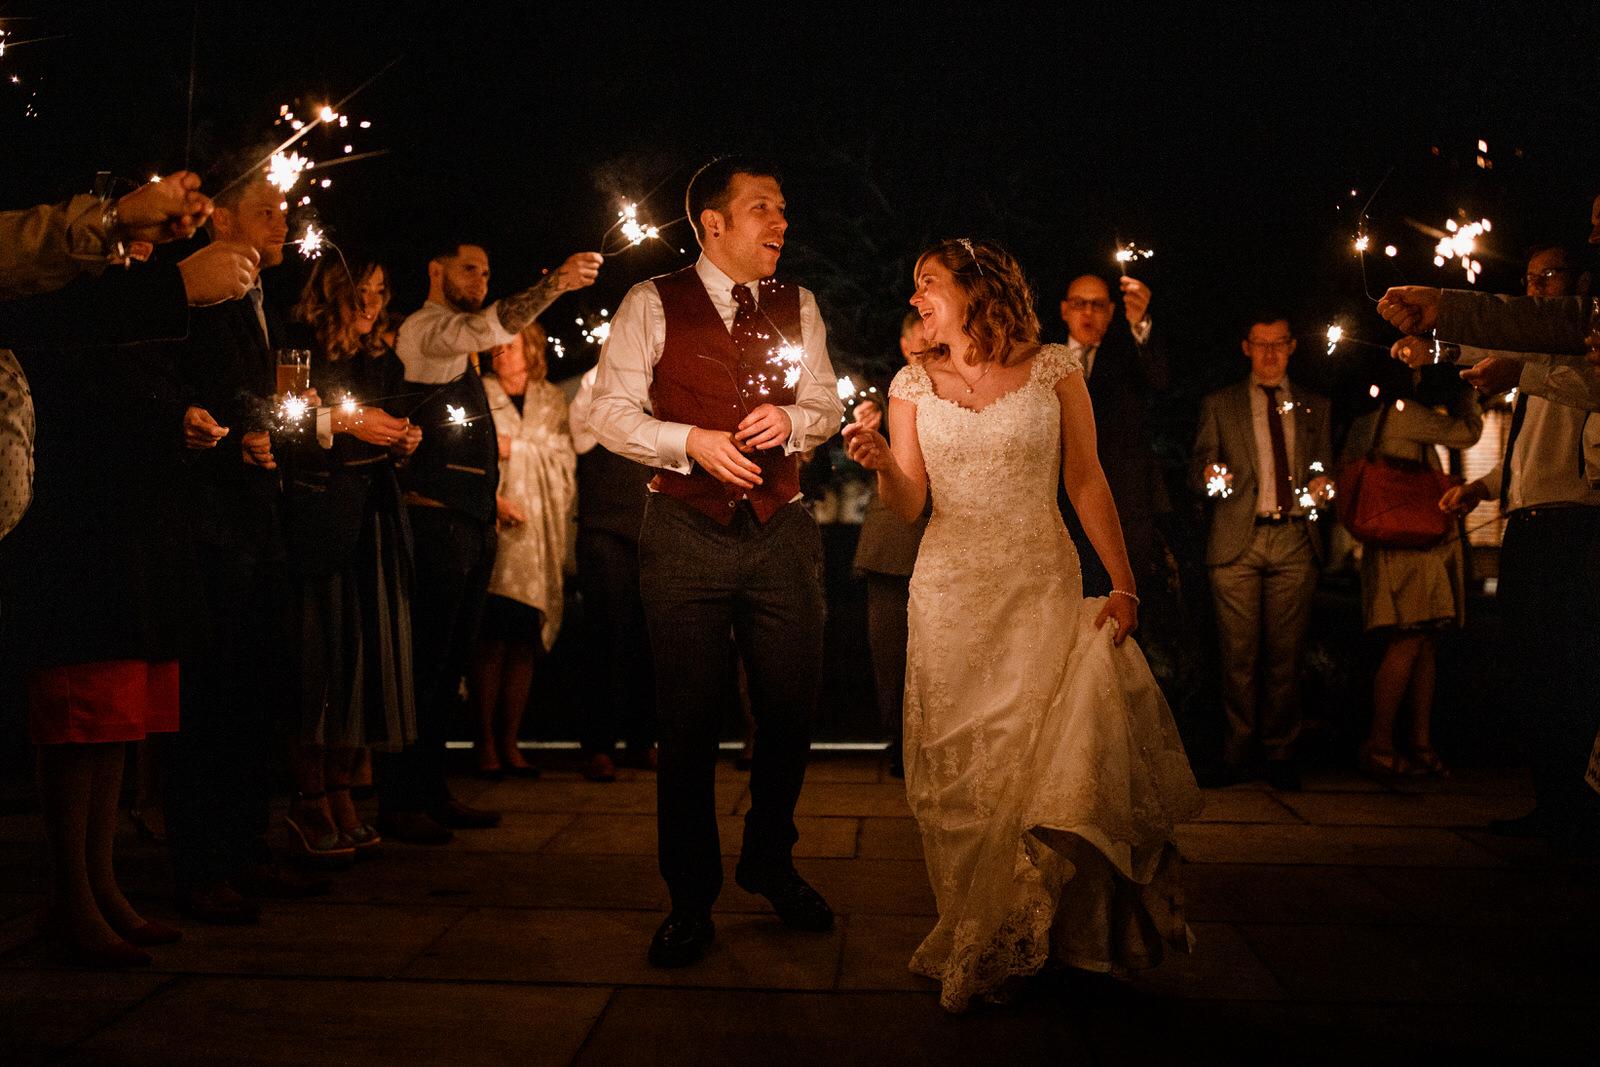 Home counties wedding photography by Damion Mower on English-Wedding.com (12)